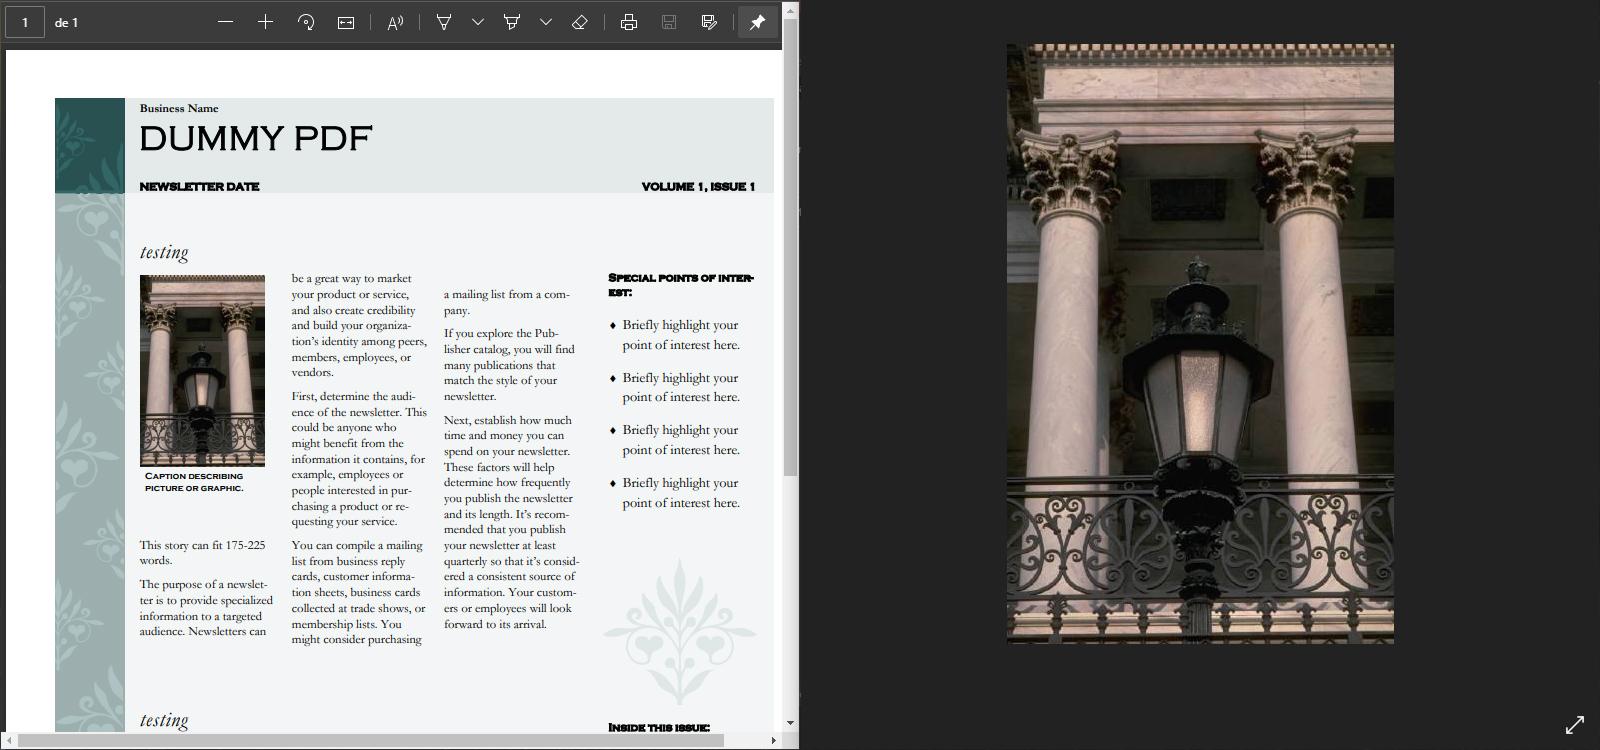 foto jpg de pdf